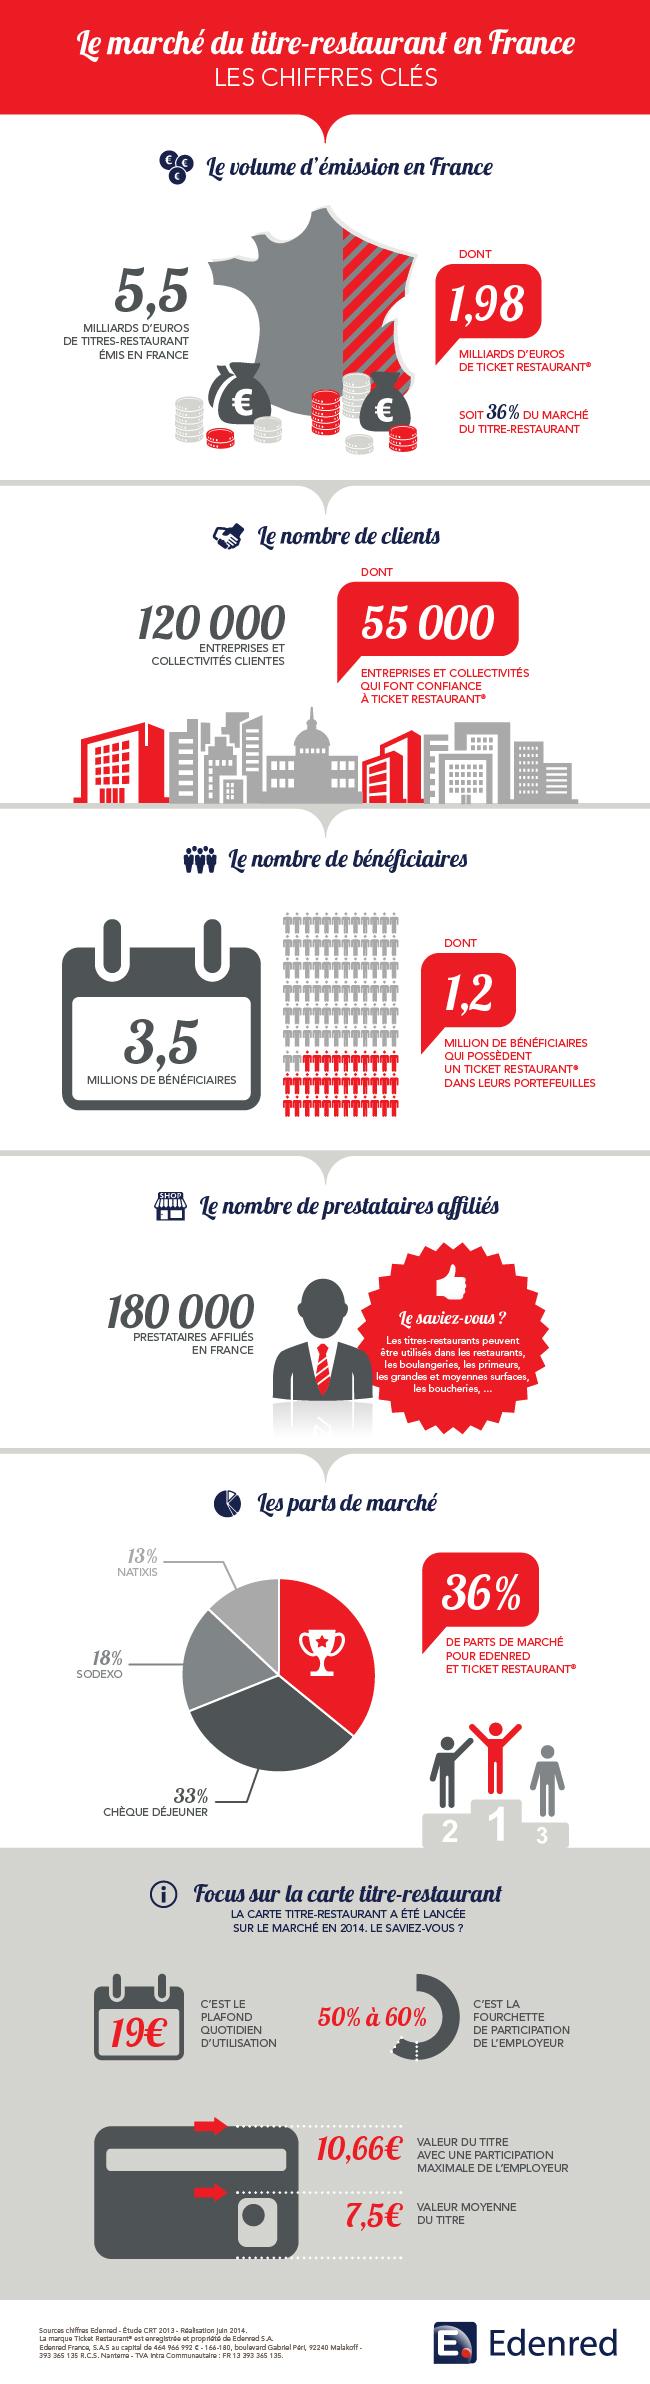 infographie_Edenred_marche_titre-restaurant